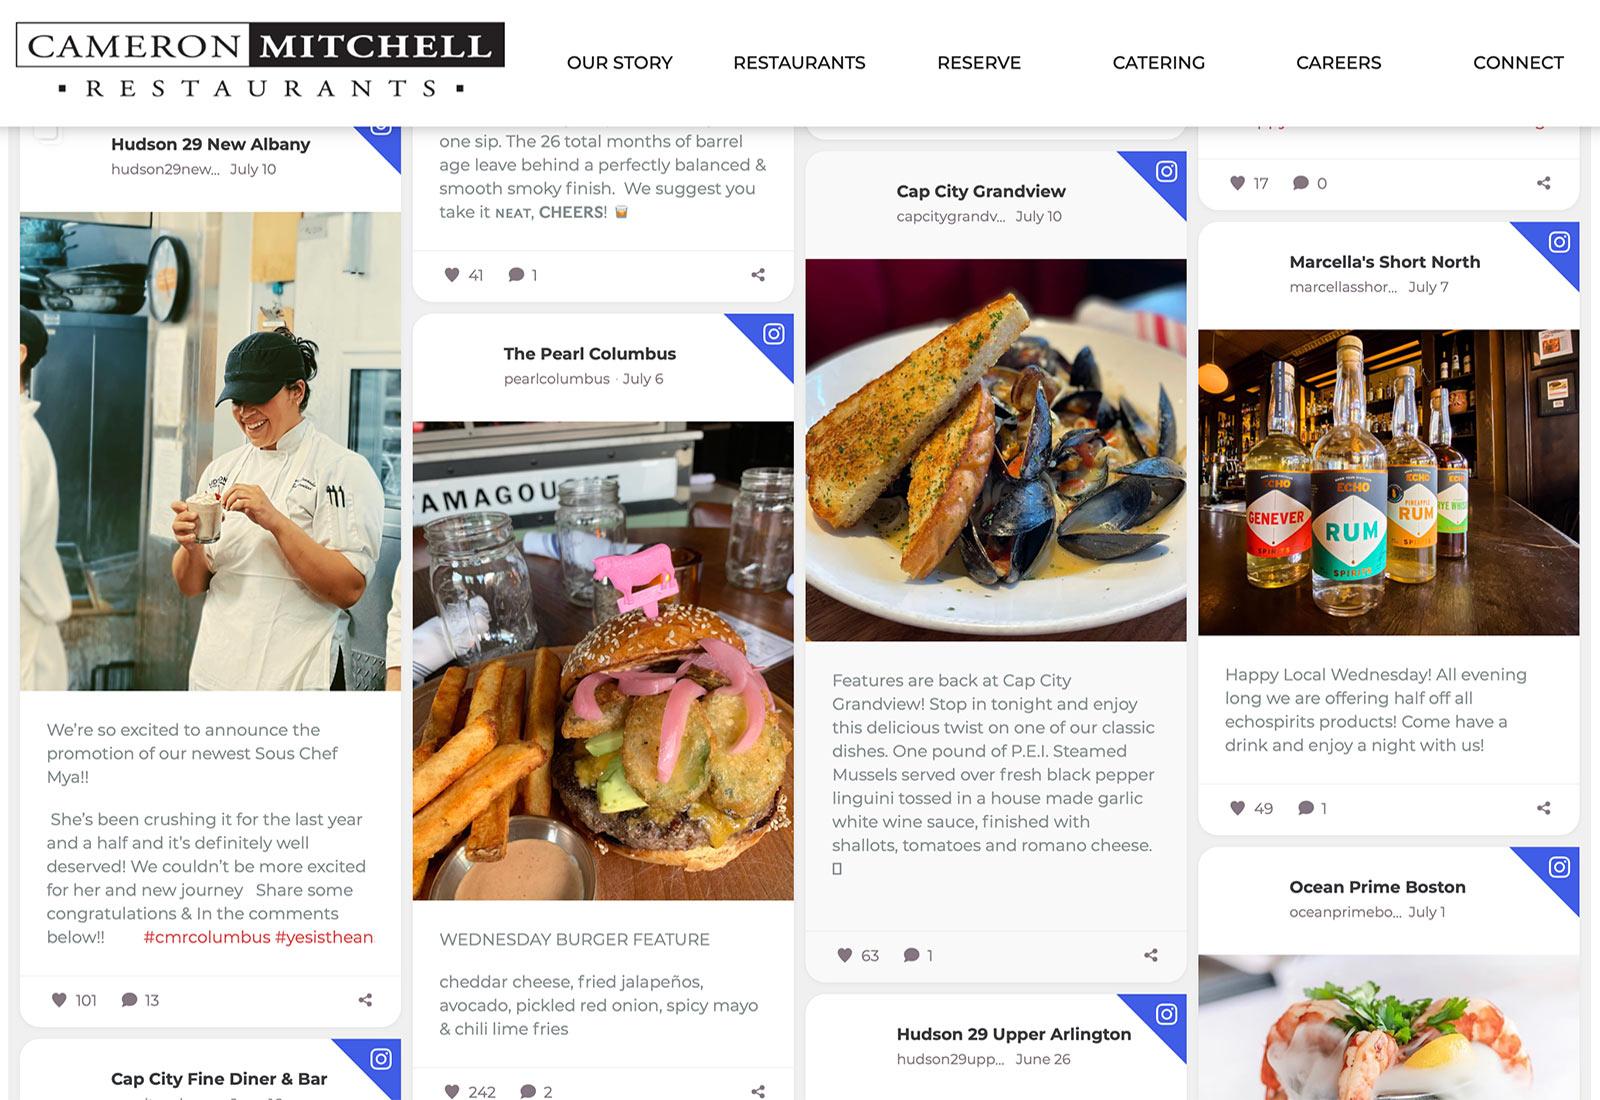 Array of Cameron Mitchell Restaurants social media posts